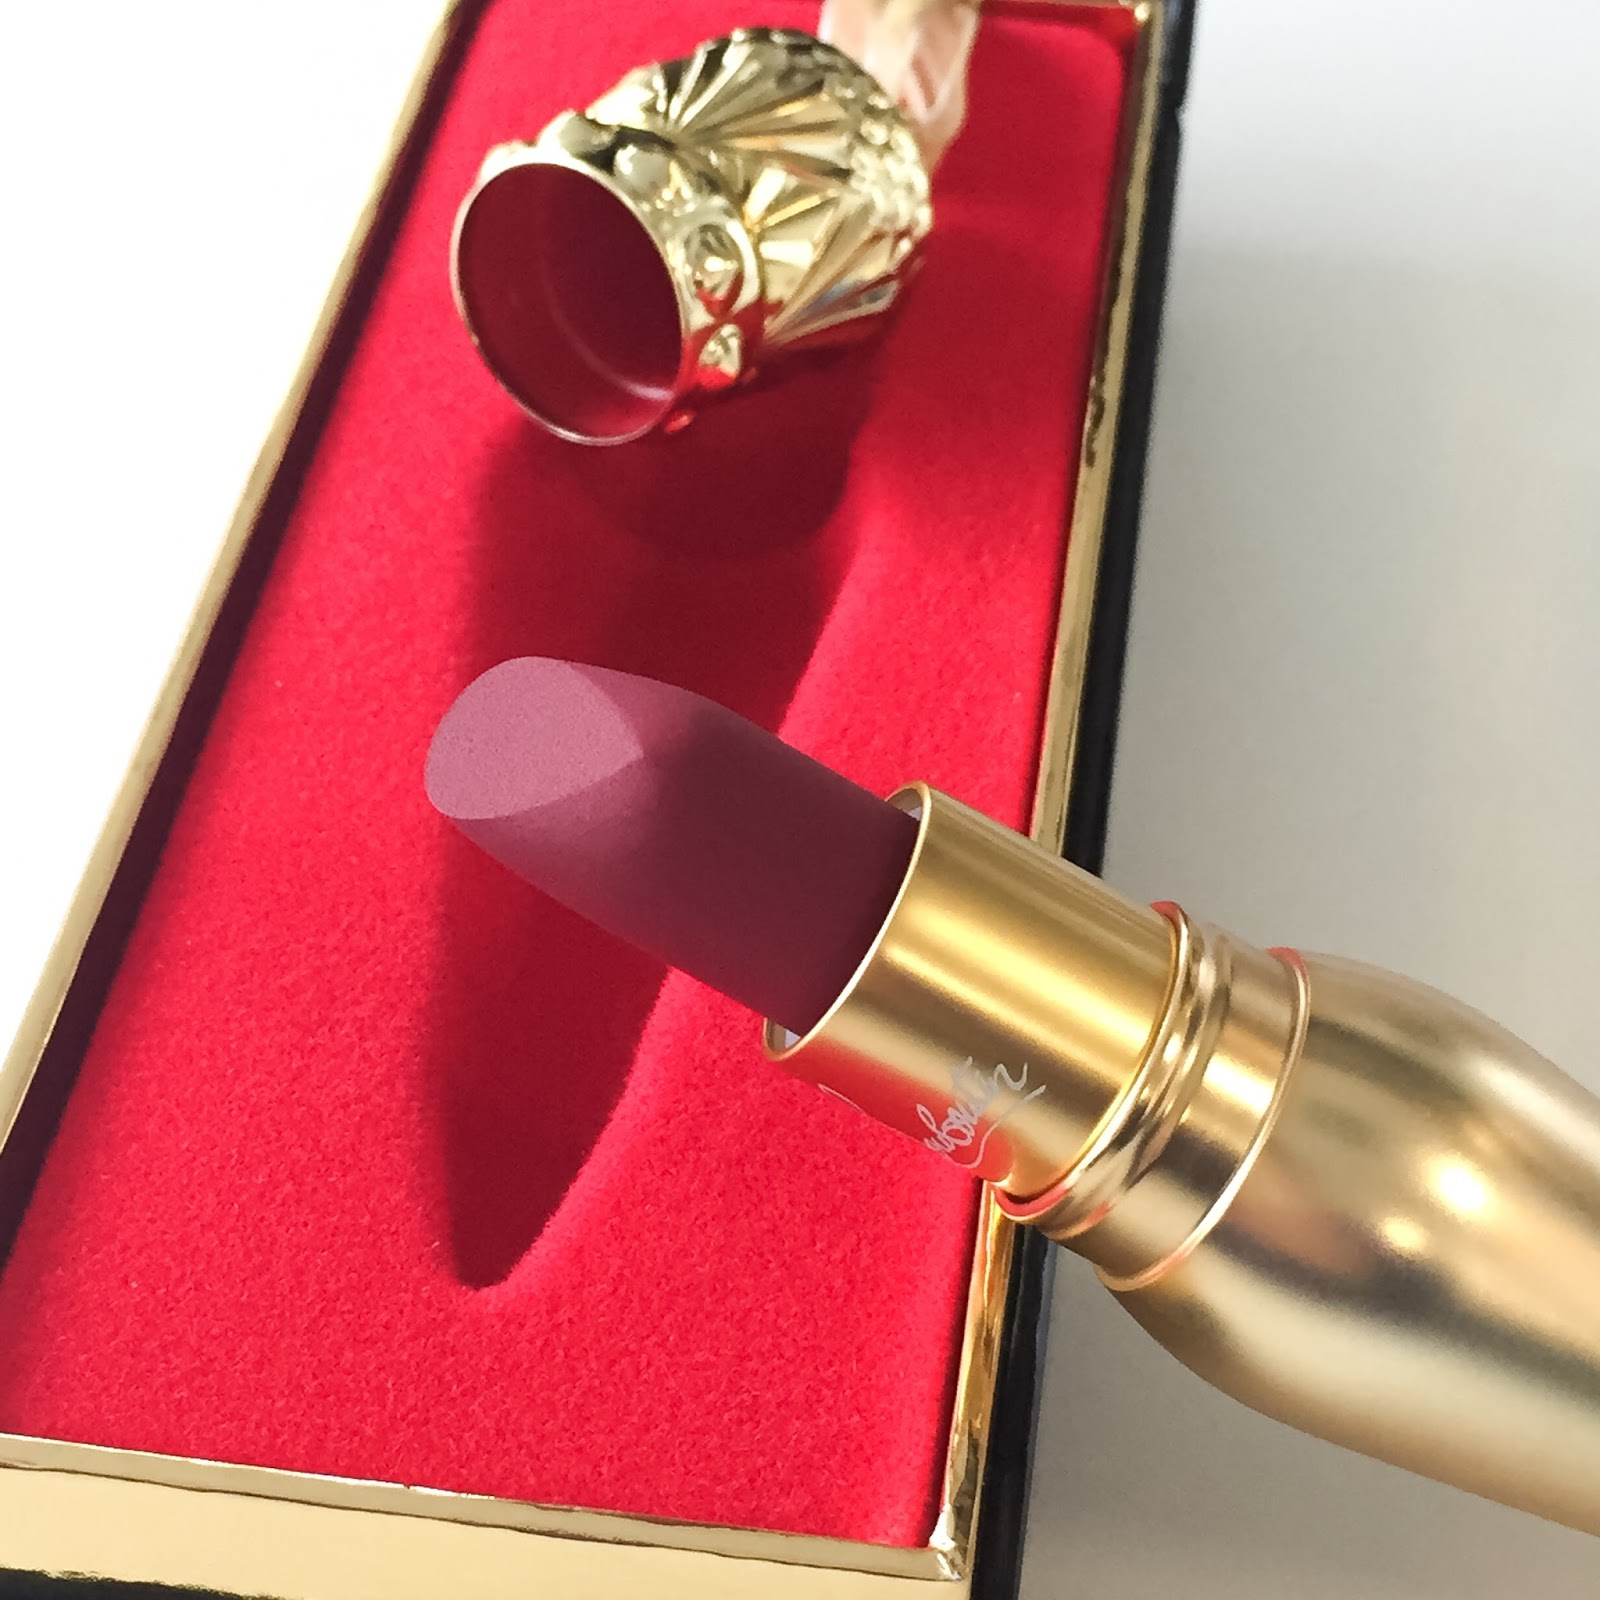 Christian Louboutin Velvet Matte Lip Colour In Survivita Review